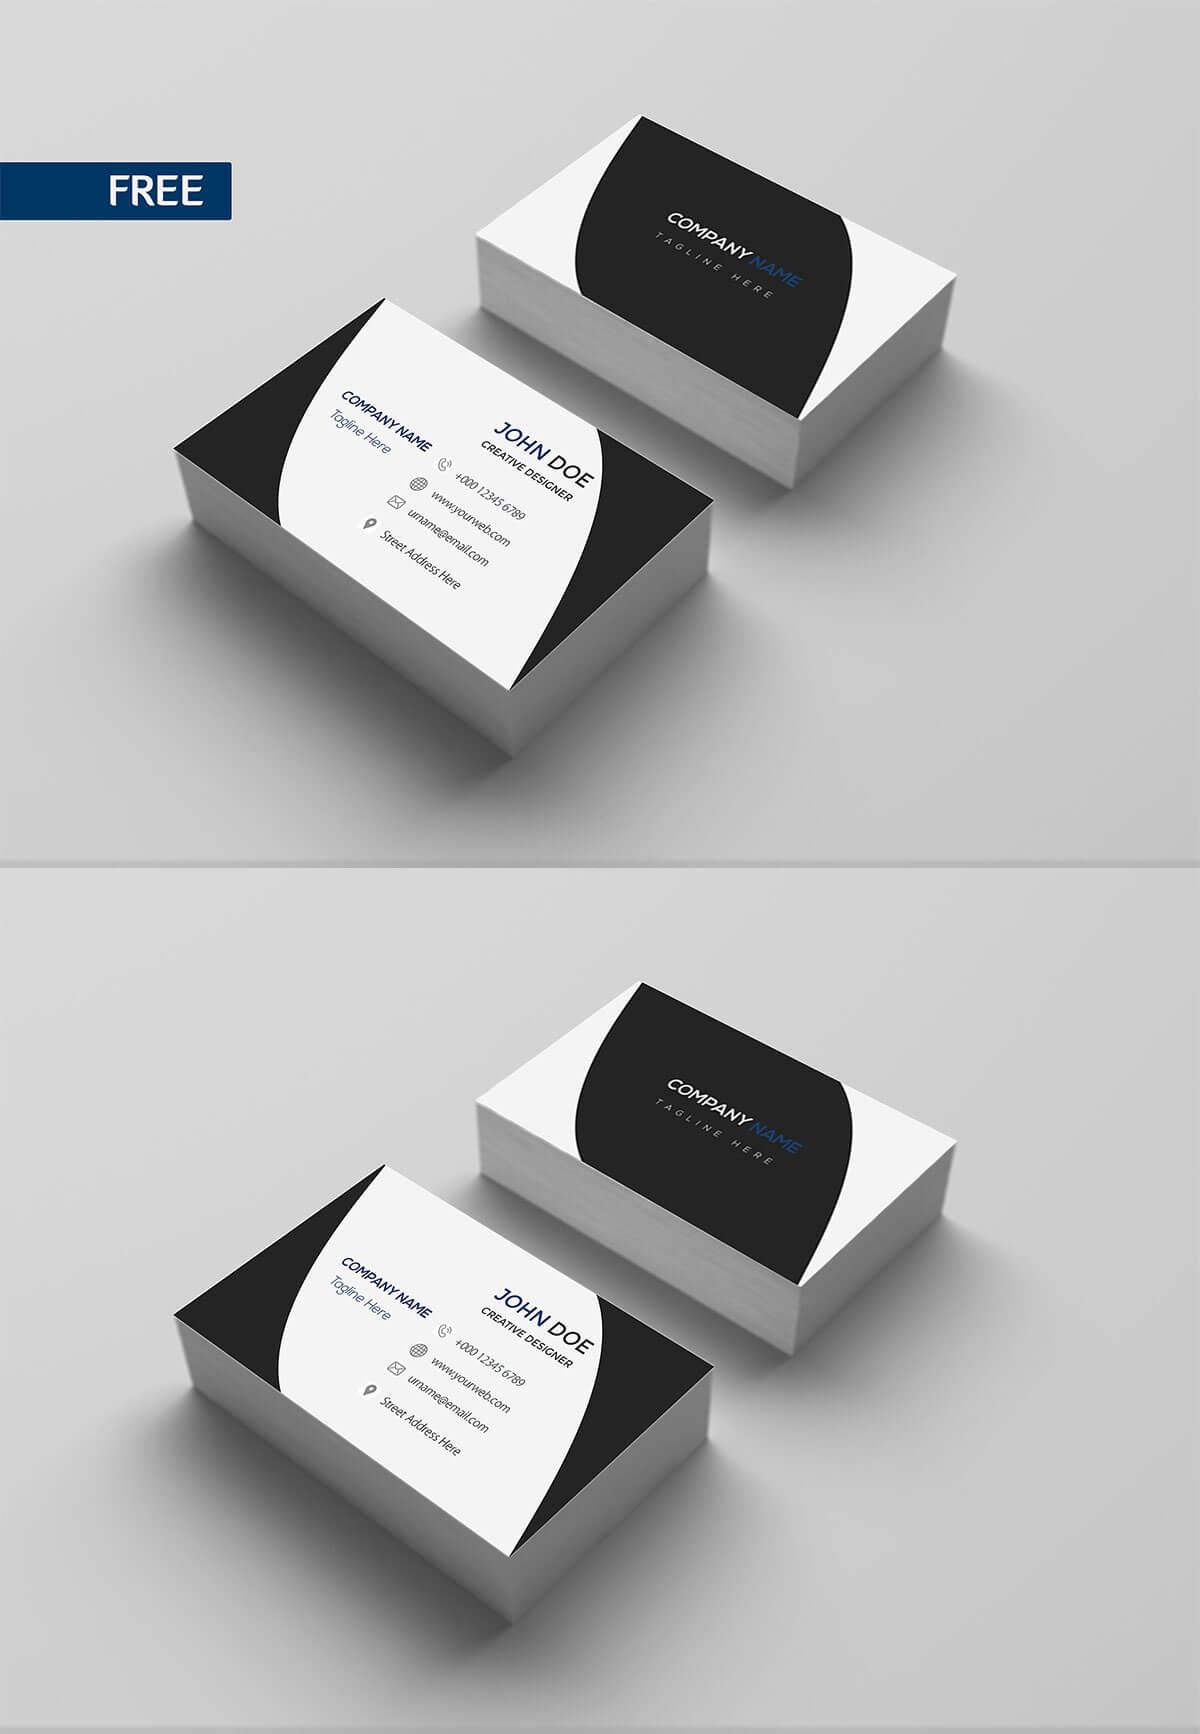 Free Print Design Business Card Template – Creativetacos Throughout Photoshop Cs6 Business Card Template